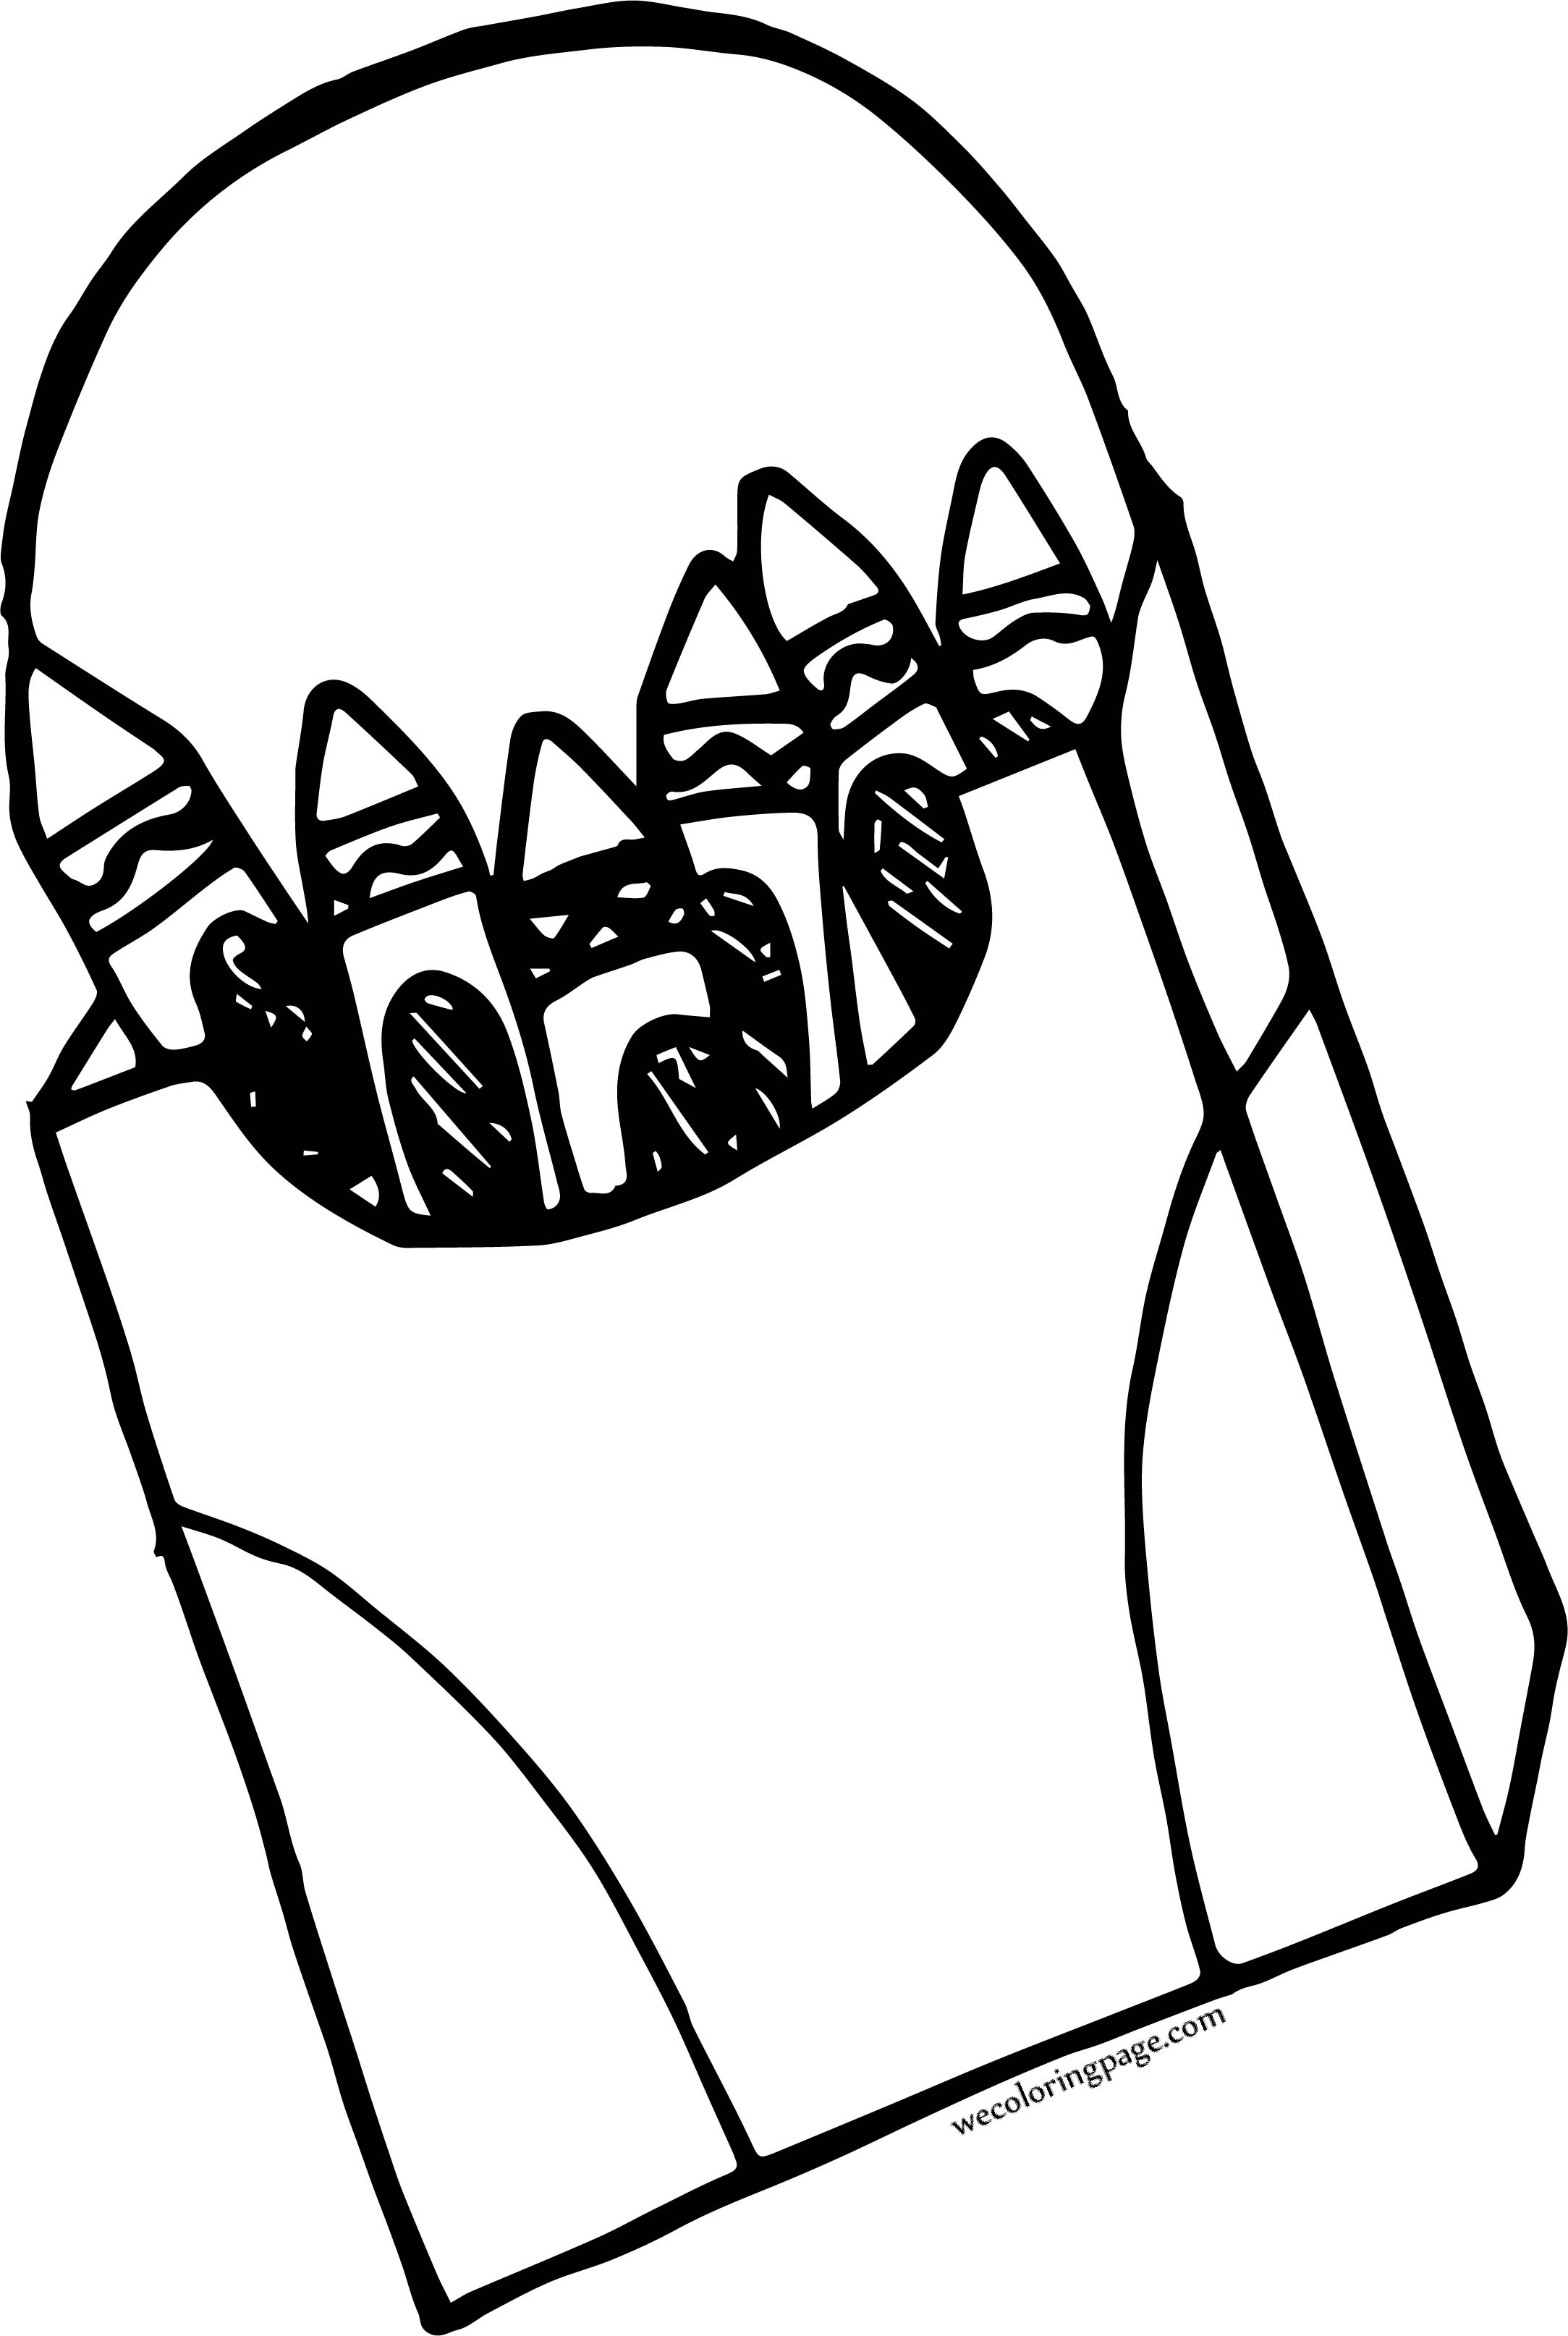 Crayon Pen Opened Box Coloring Page | Wecoloringpage.com